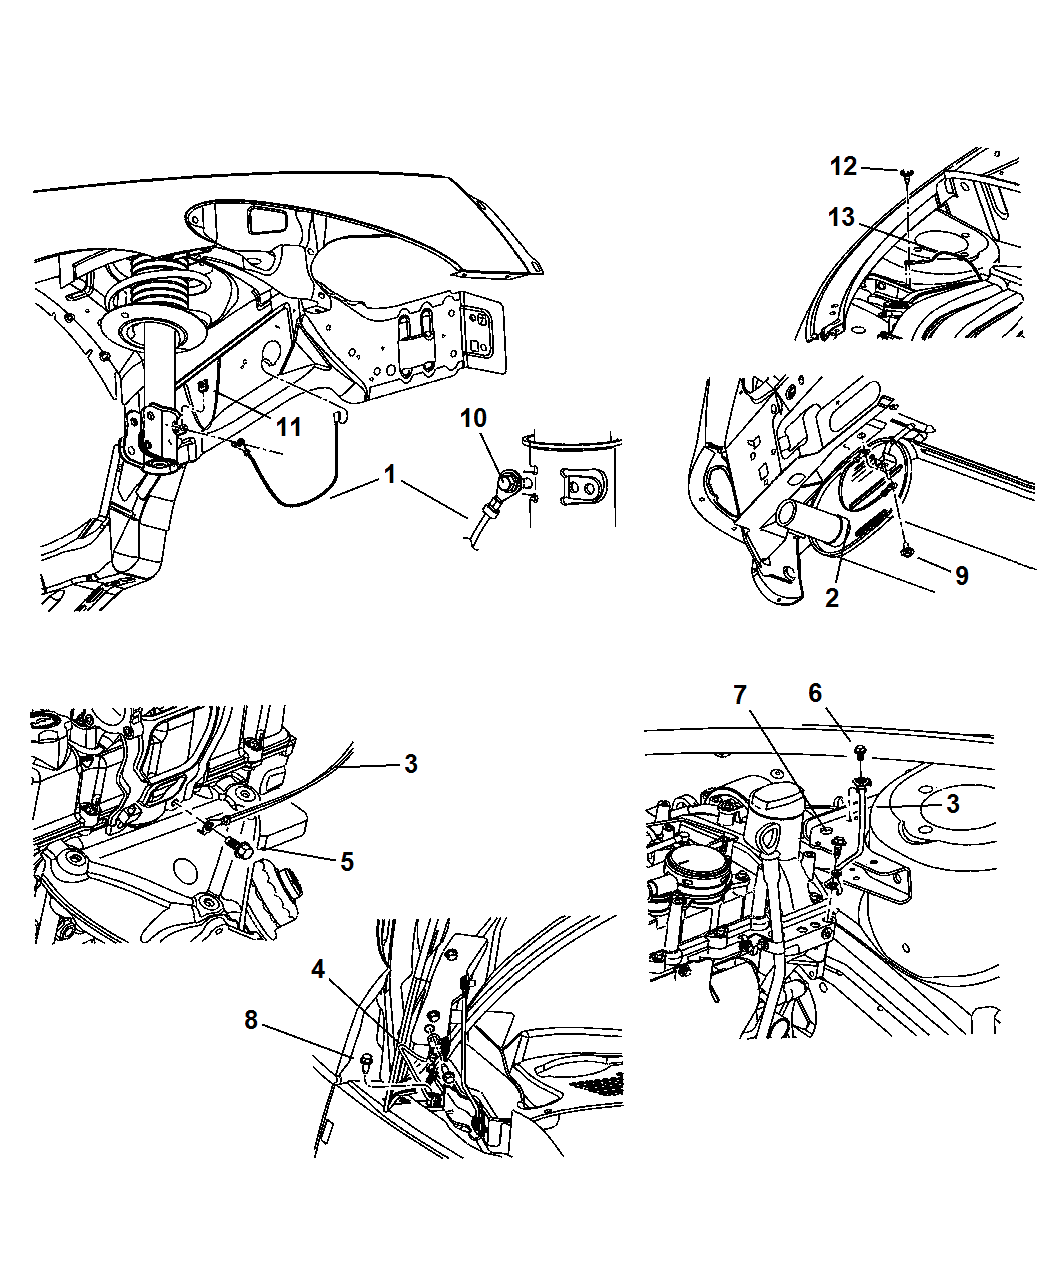 srt4 belt diagram sb 6334  4l dohc timing belt diagram turbo dodge forums turbo  4l dohc timing belt diagram turbo dodge